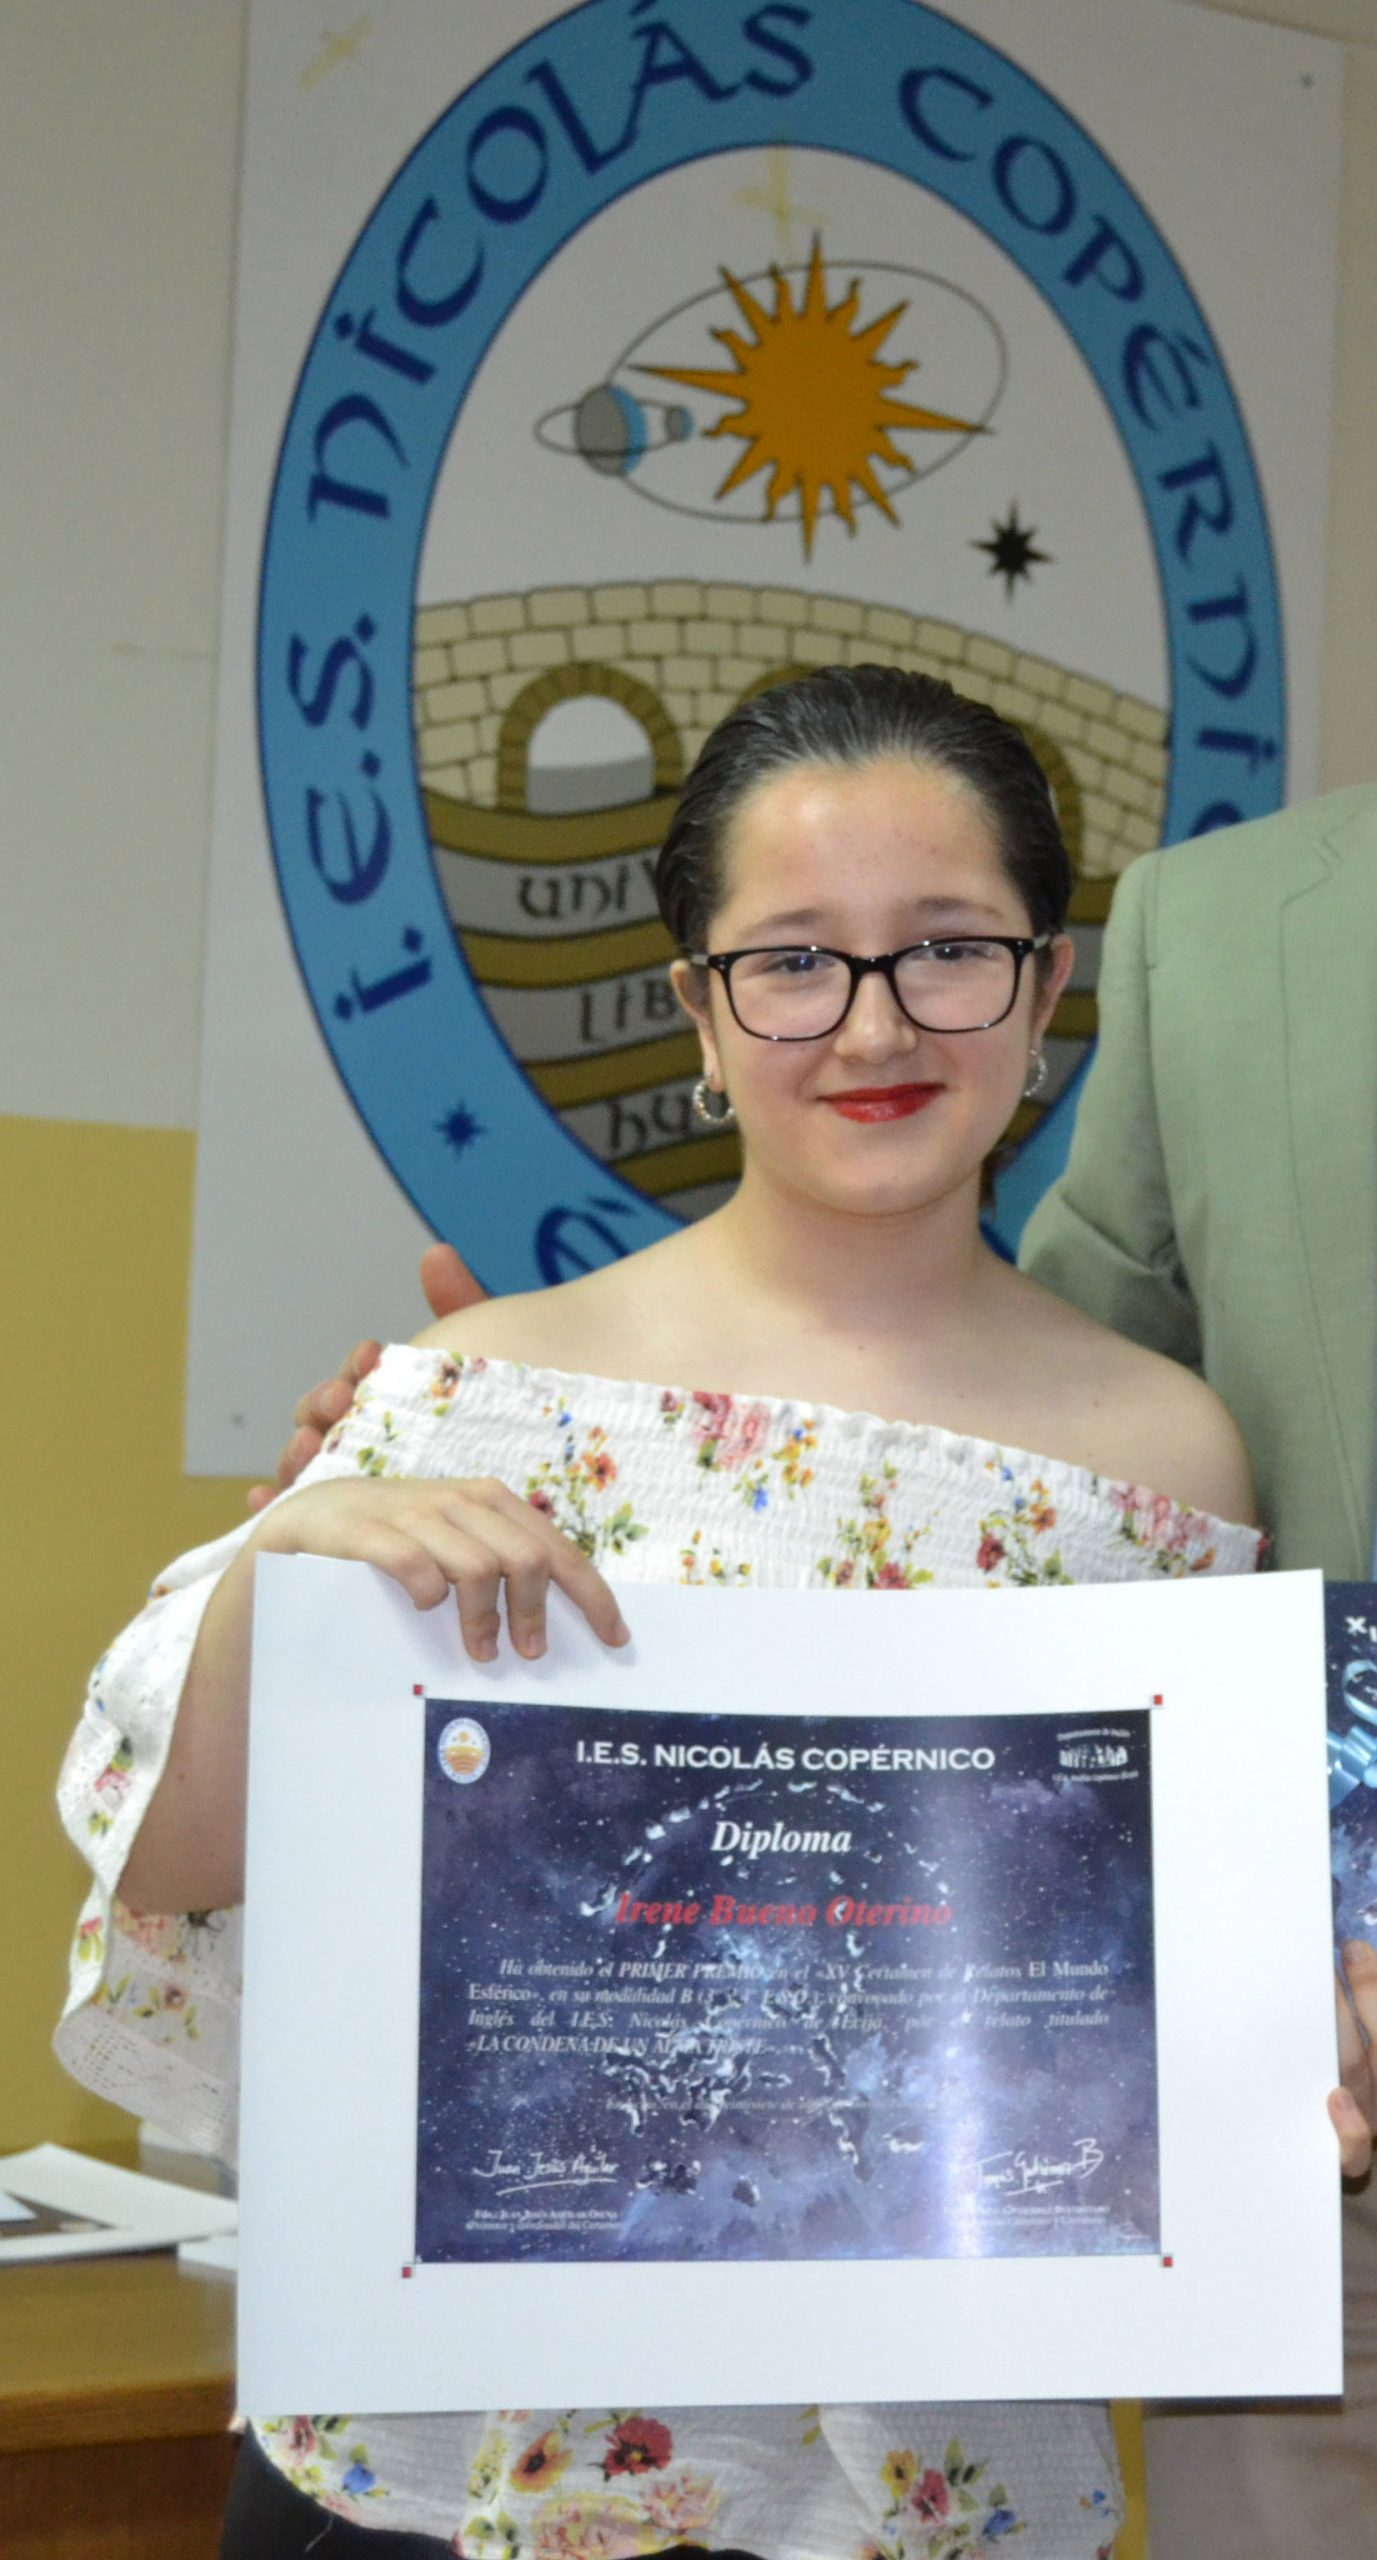 Irene Bueno Oterino, segundo premio en el «XXVI Premio Internacional Miguel Fernández» de Melilla